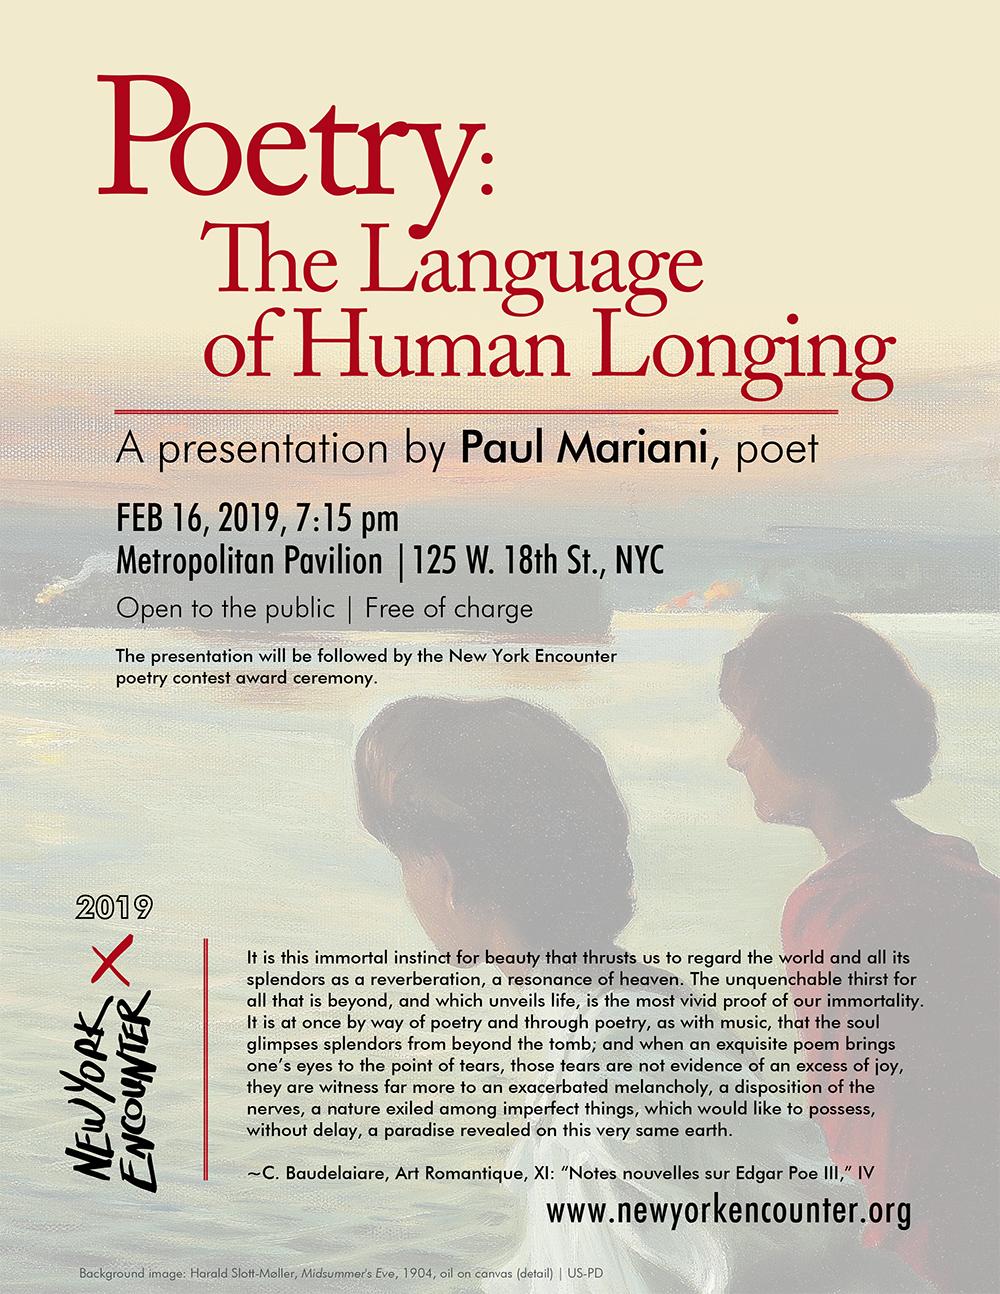 Poetry-The-Language-of-Human-Longing.jpg